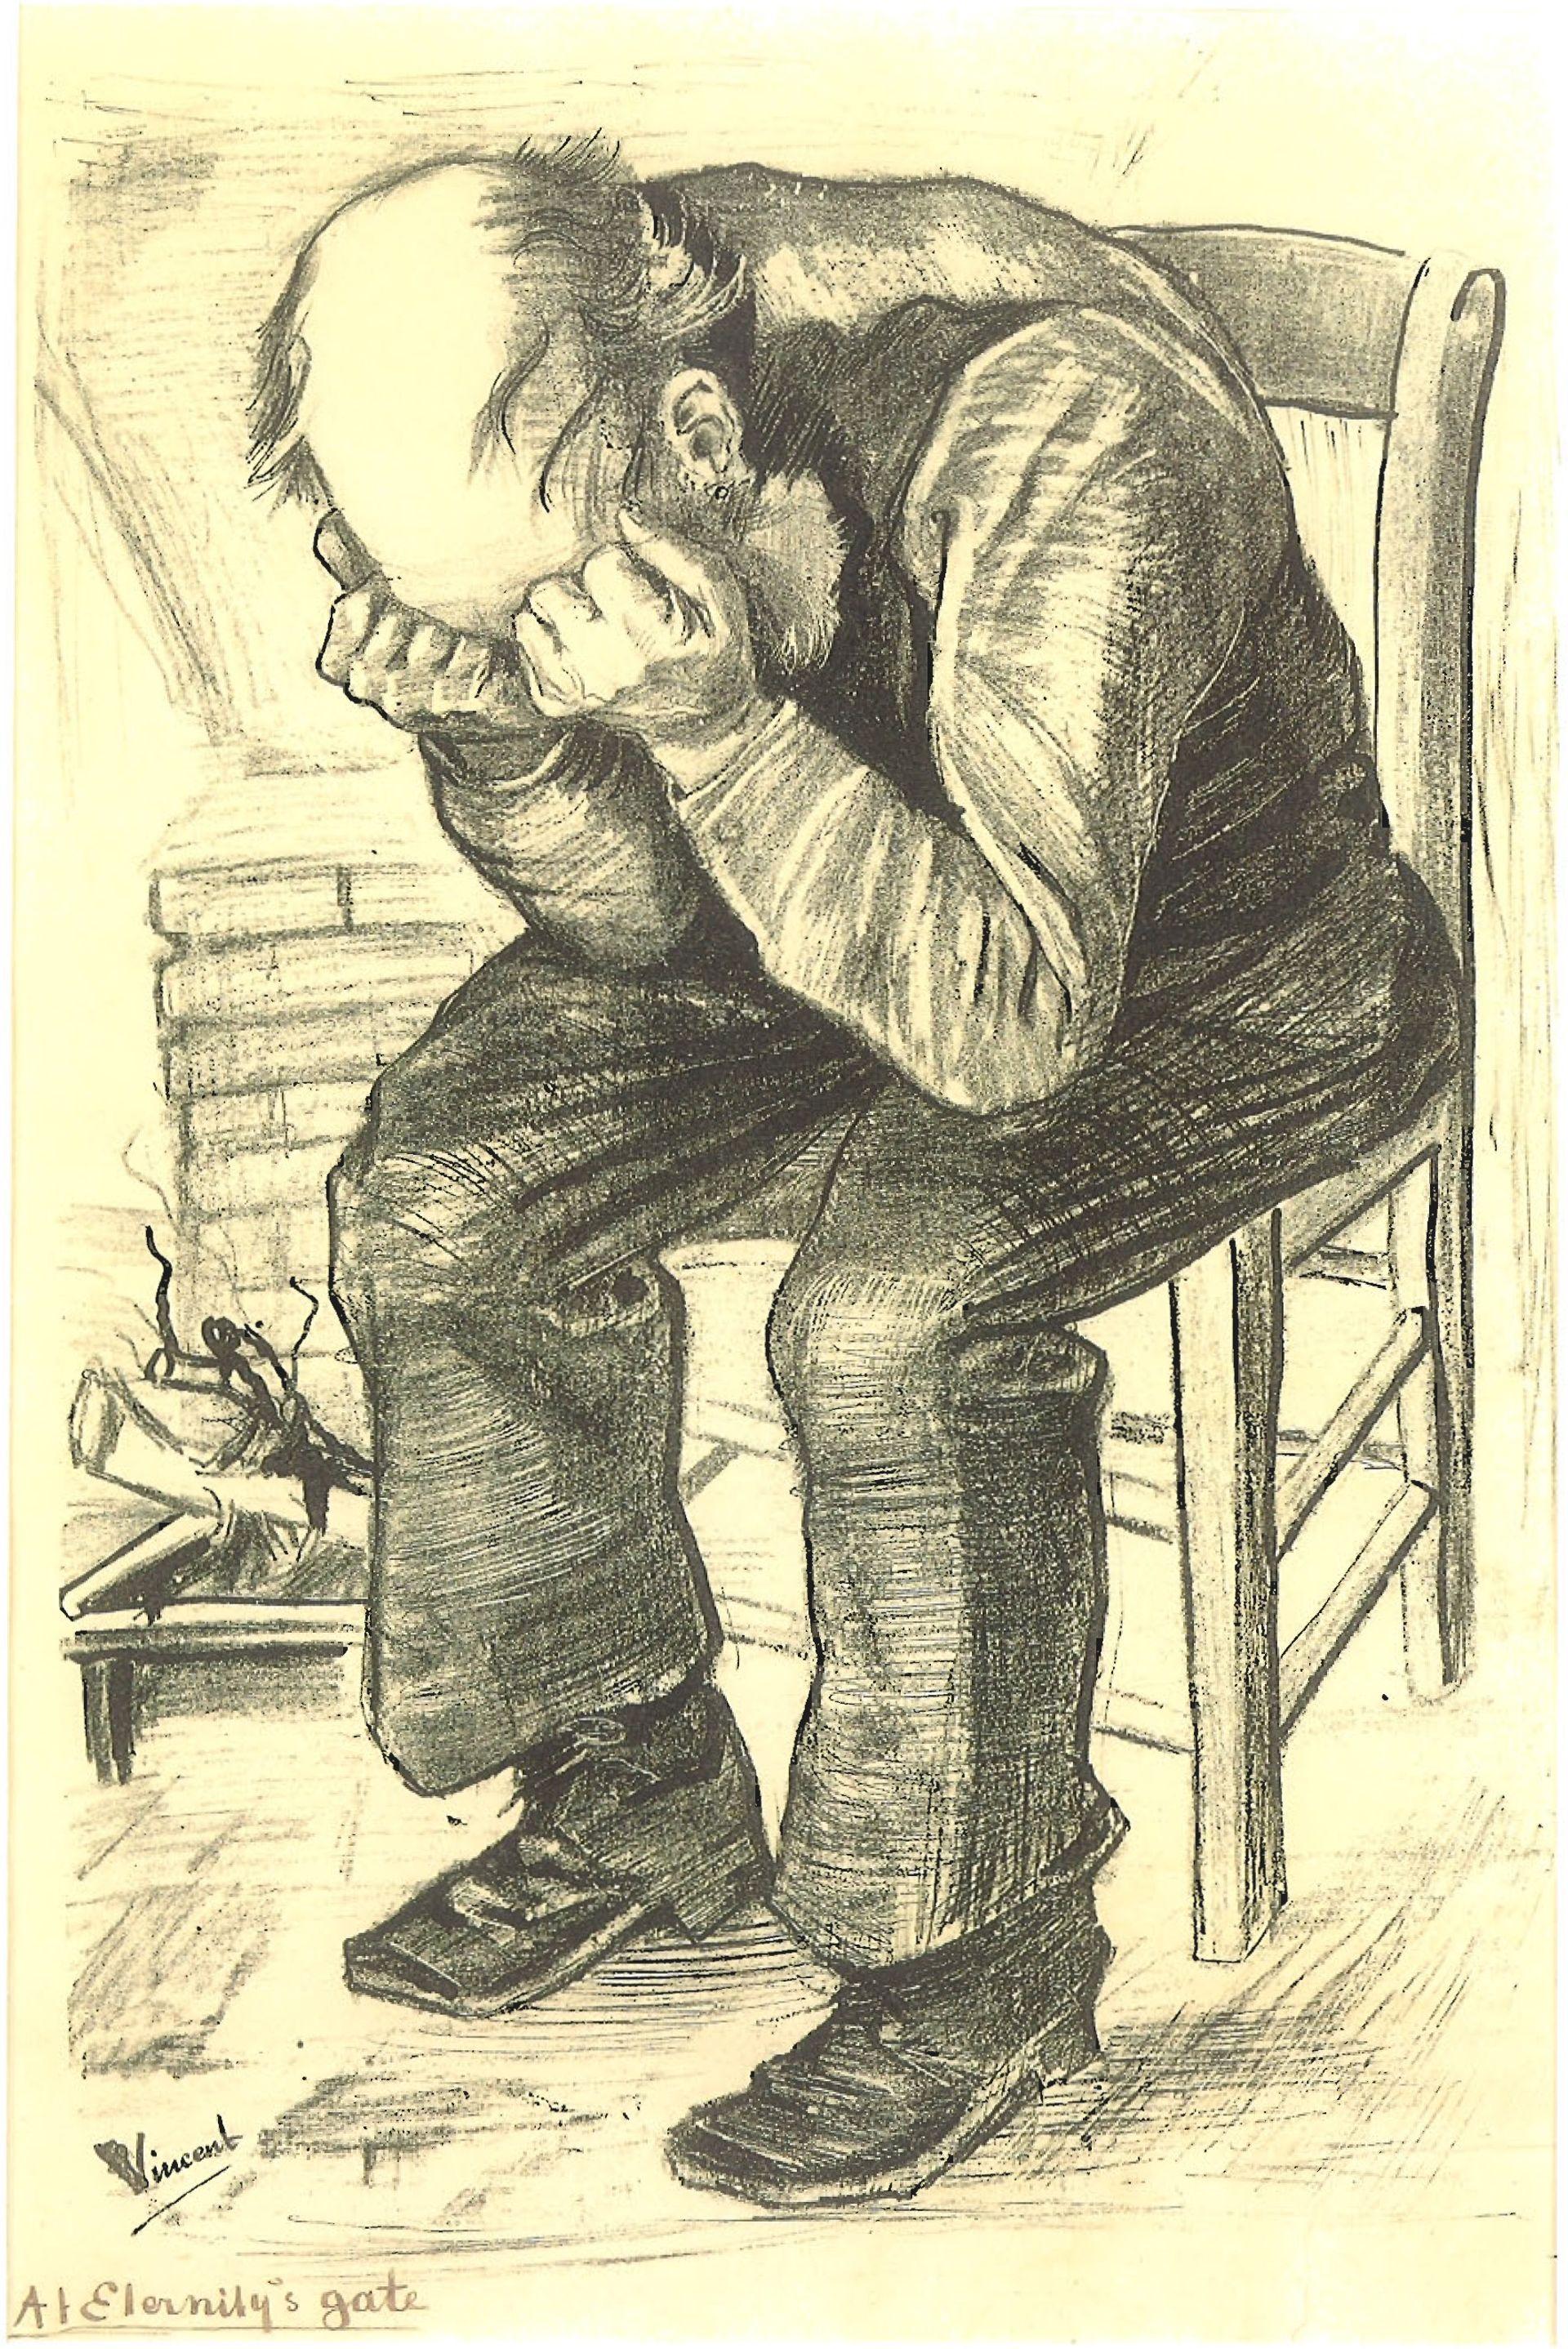 Vincent van Gogh's lithograph At Eternity's Gate (November 1882) Courtesy of Skira, Milan